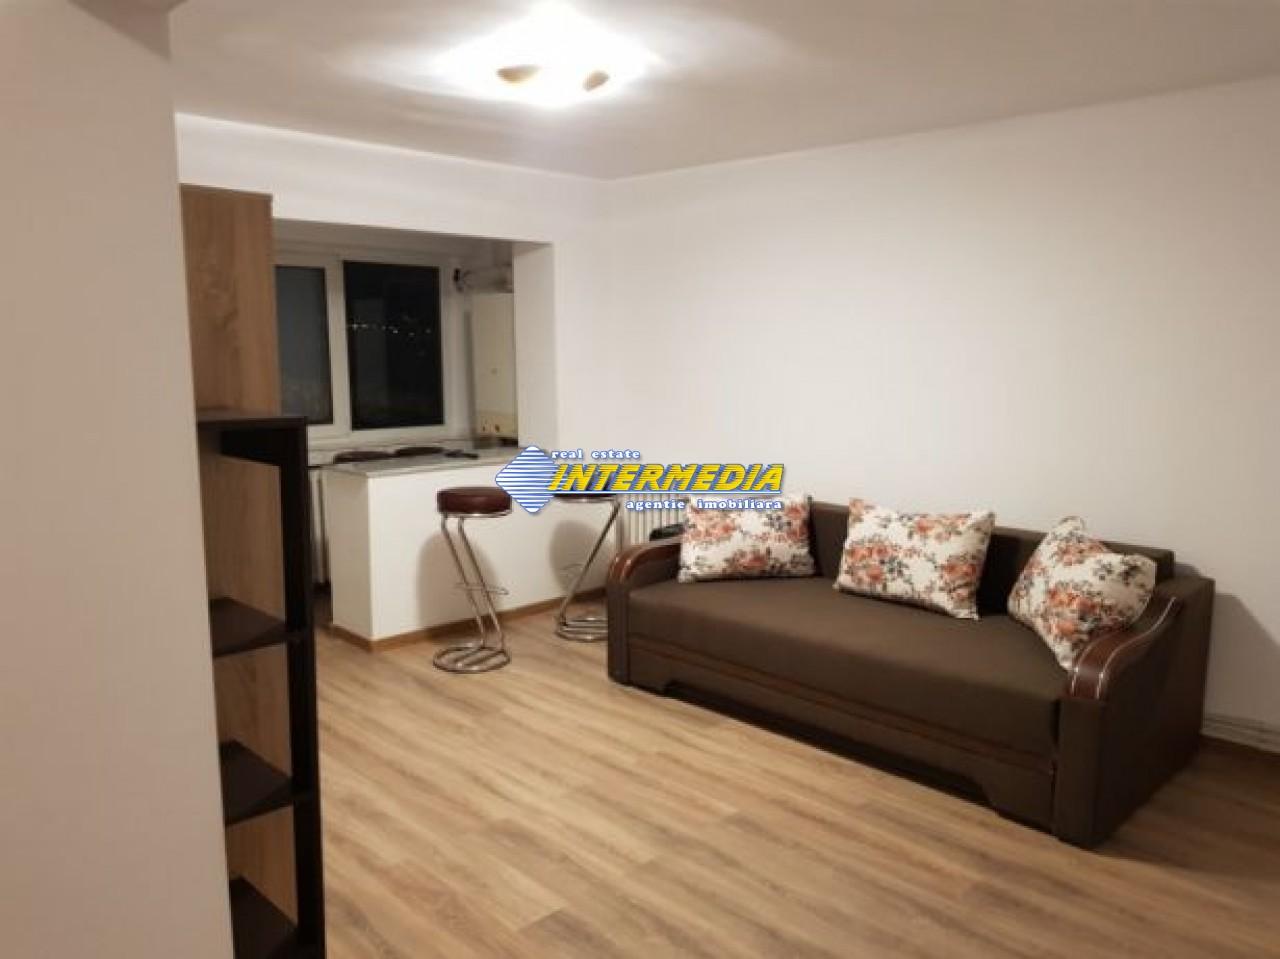 229245537_7_644x461_apartament-2-camere-2-balcoane-bloc-m-_rev016.jpg